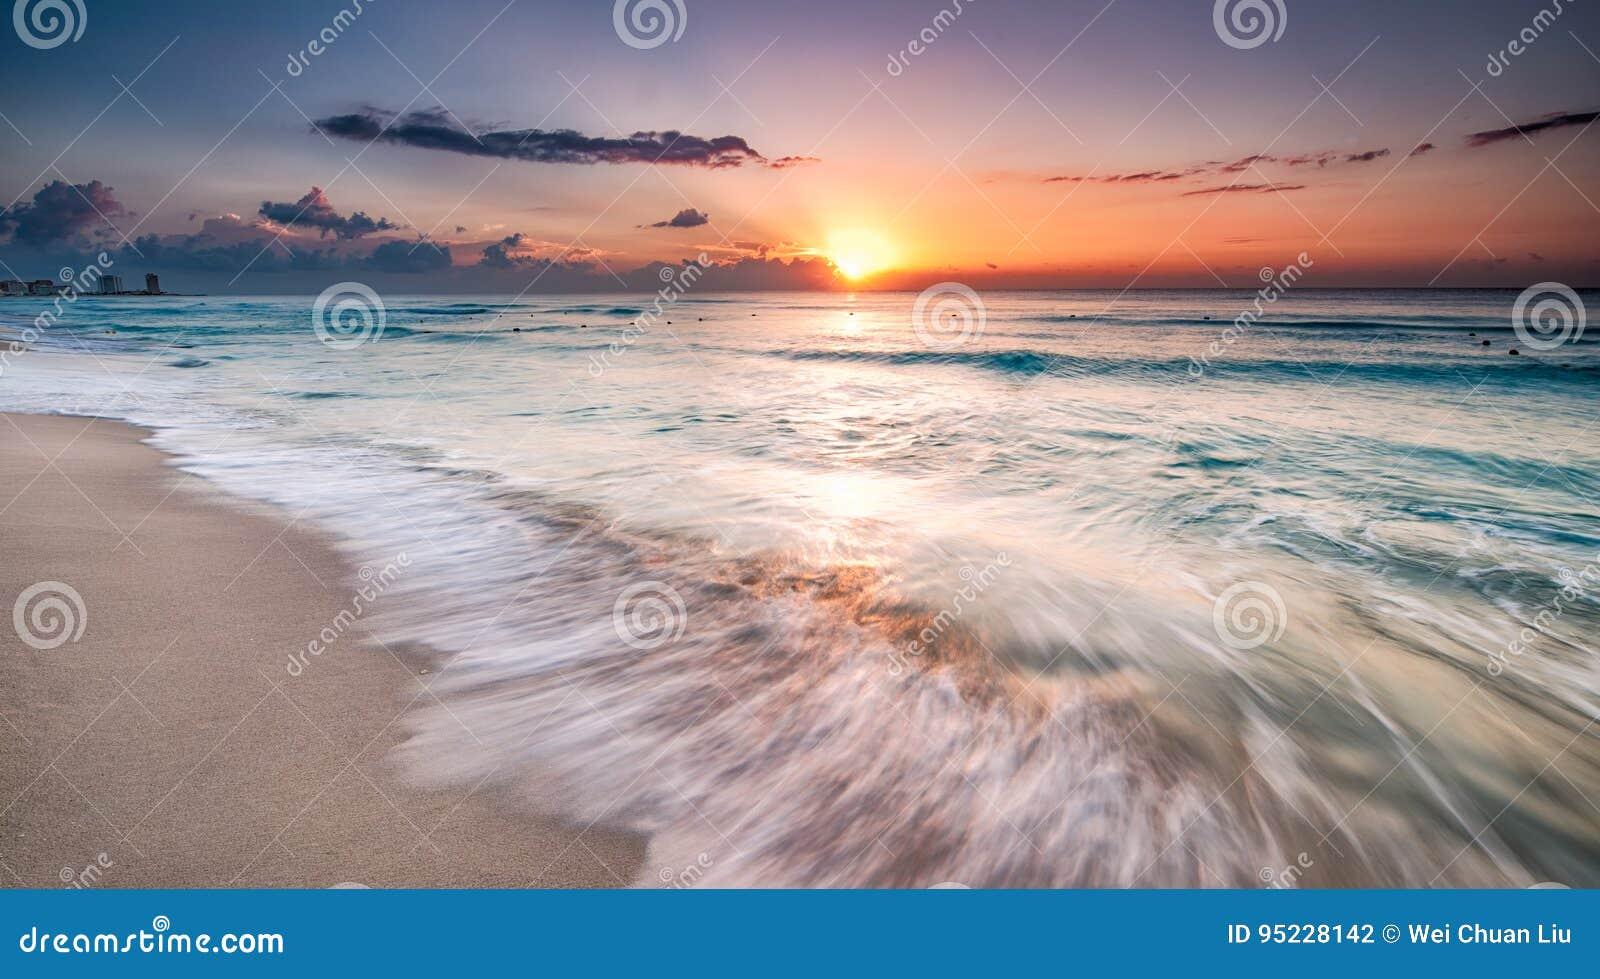 Schöner Sonnenaufgang in Cancun